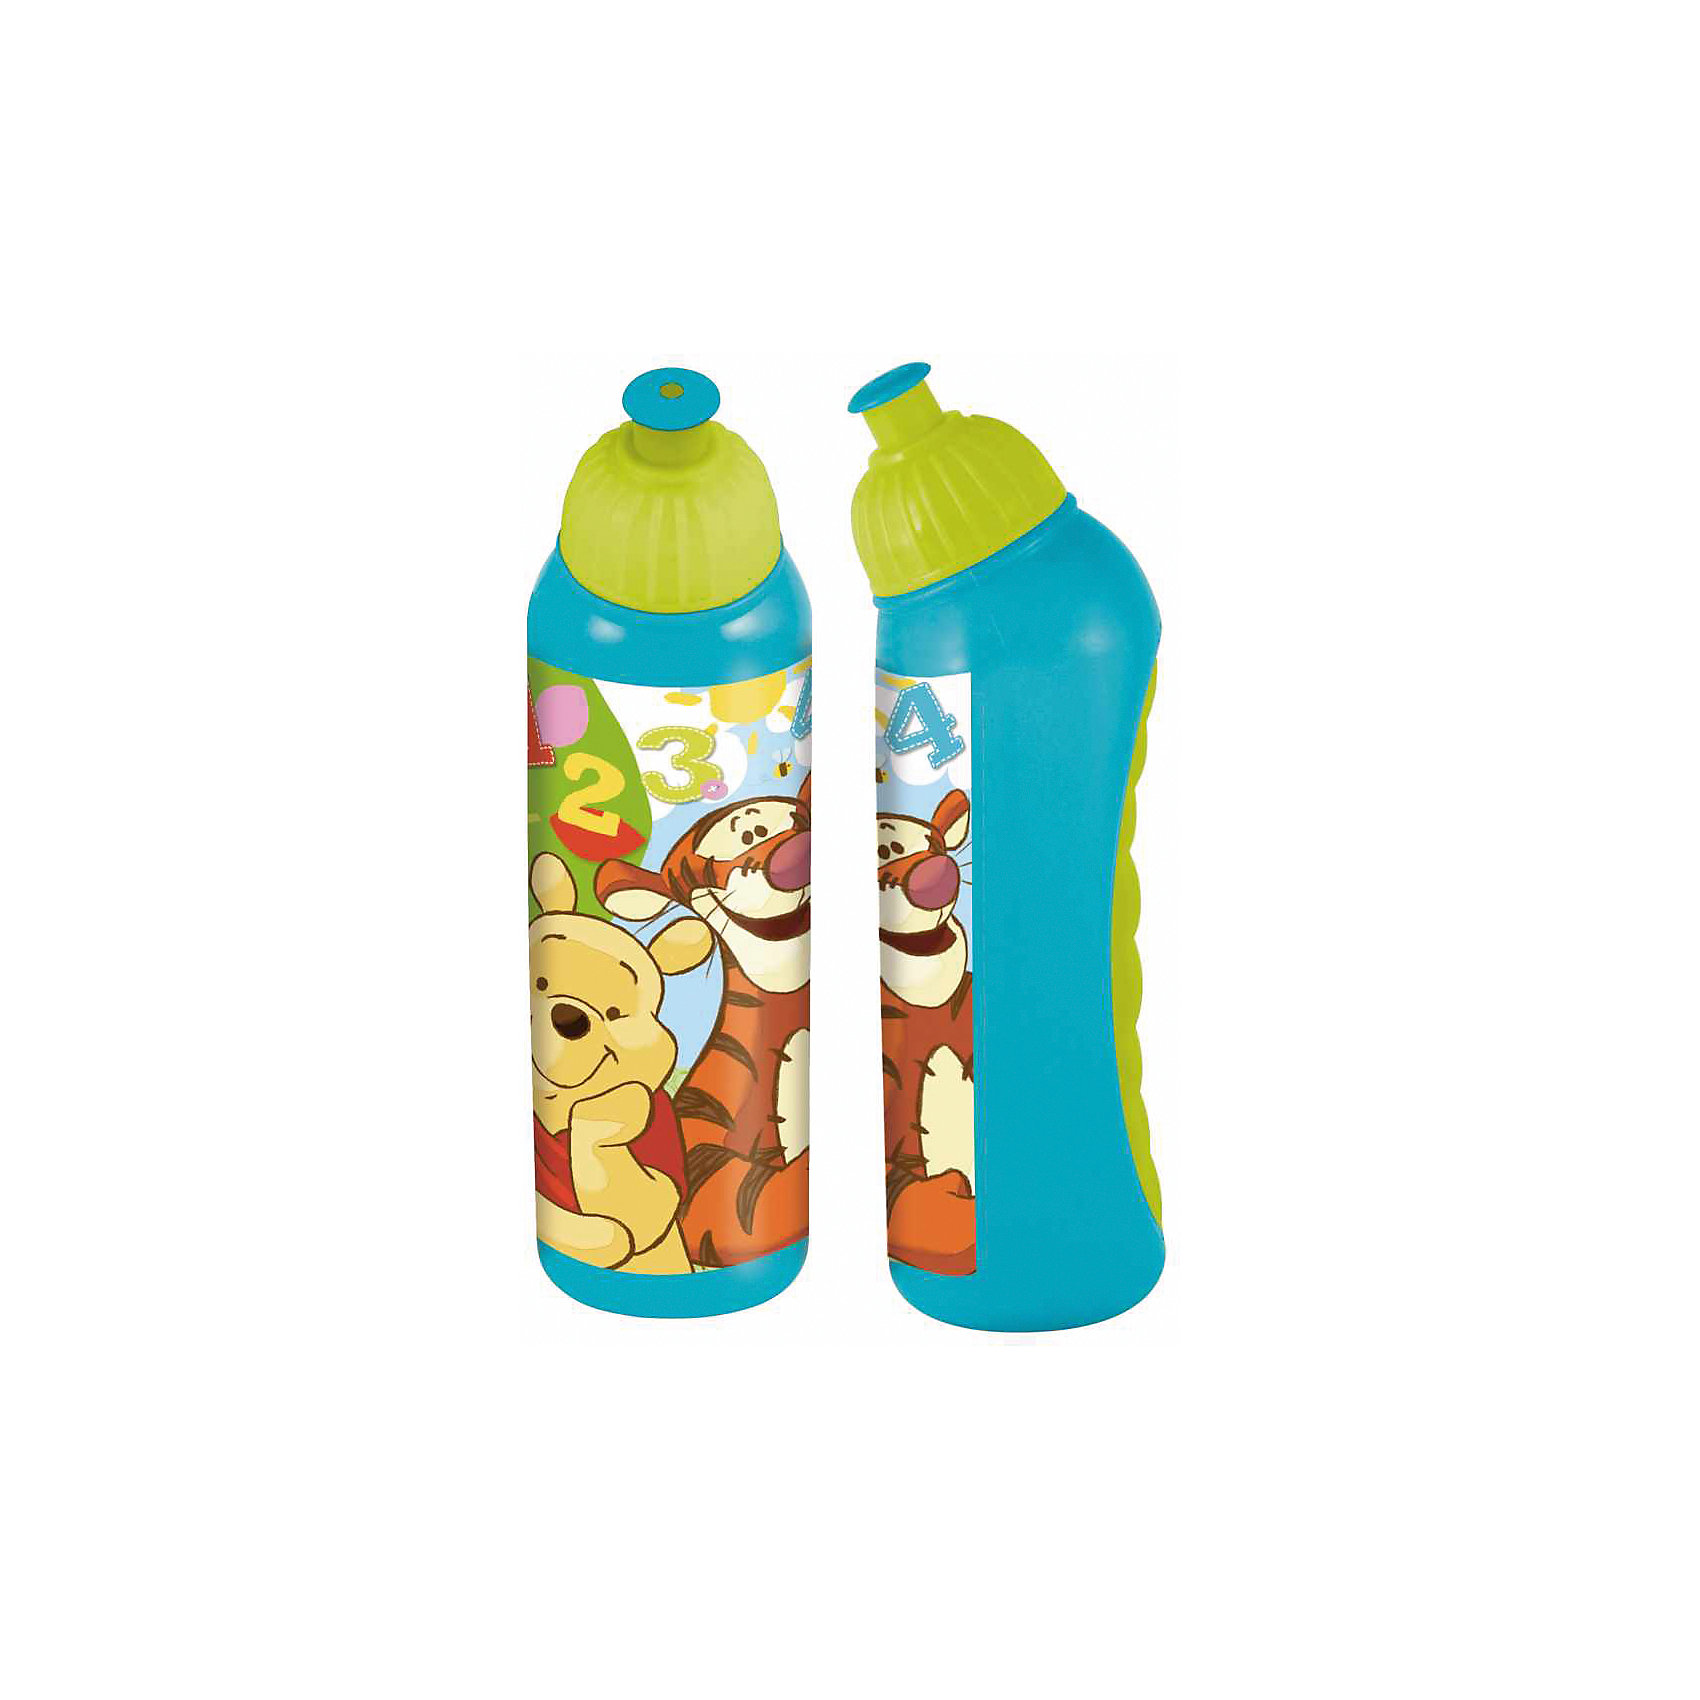 Спортивная бутылка (400 мл), Винни-Пух<br><br>Ширина мм: 62<br>Глубина мм: 58<br>Высота мм: 208<br>Вес г: 68<br>Возраст от месяцев: 36<br>Возраст до месяцев: 144<br>Пол: Унисекс<br>Возраст: Детский<br>SKU: 4748007